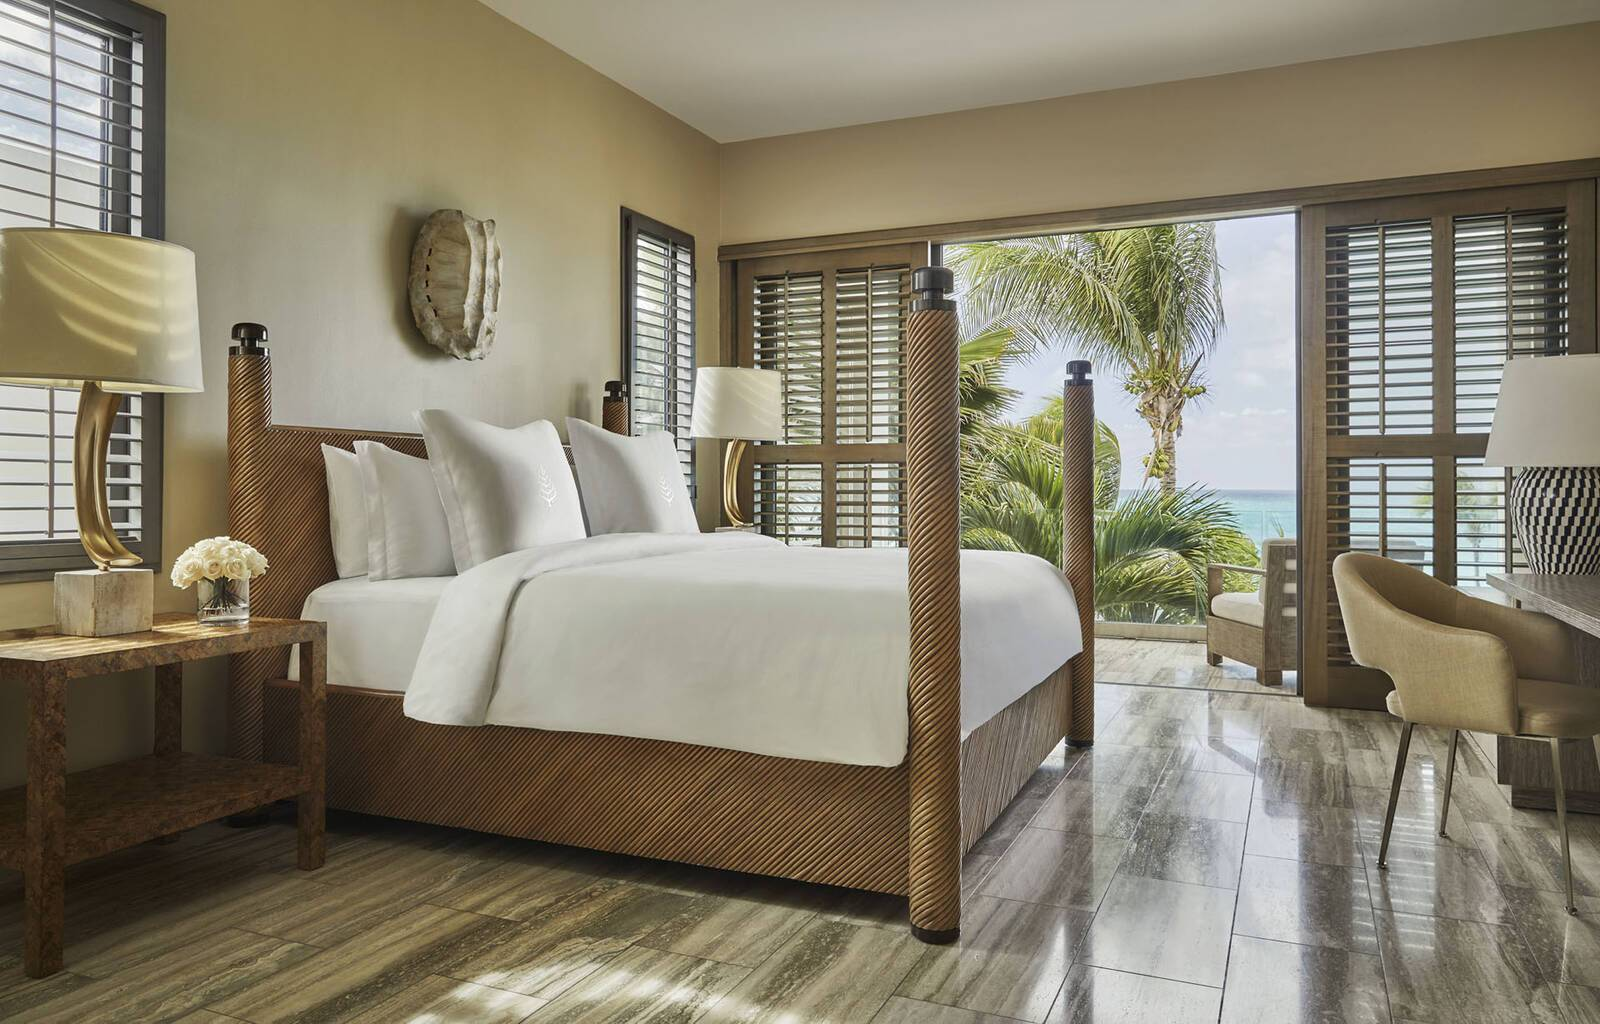 Four Seasons Anguilla Four Bedroom Oceanfront Villa AnguillaJPG